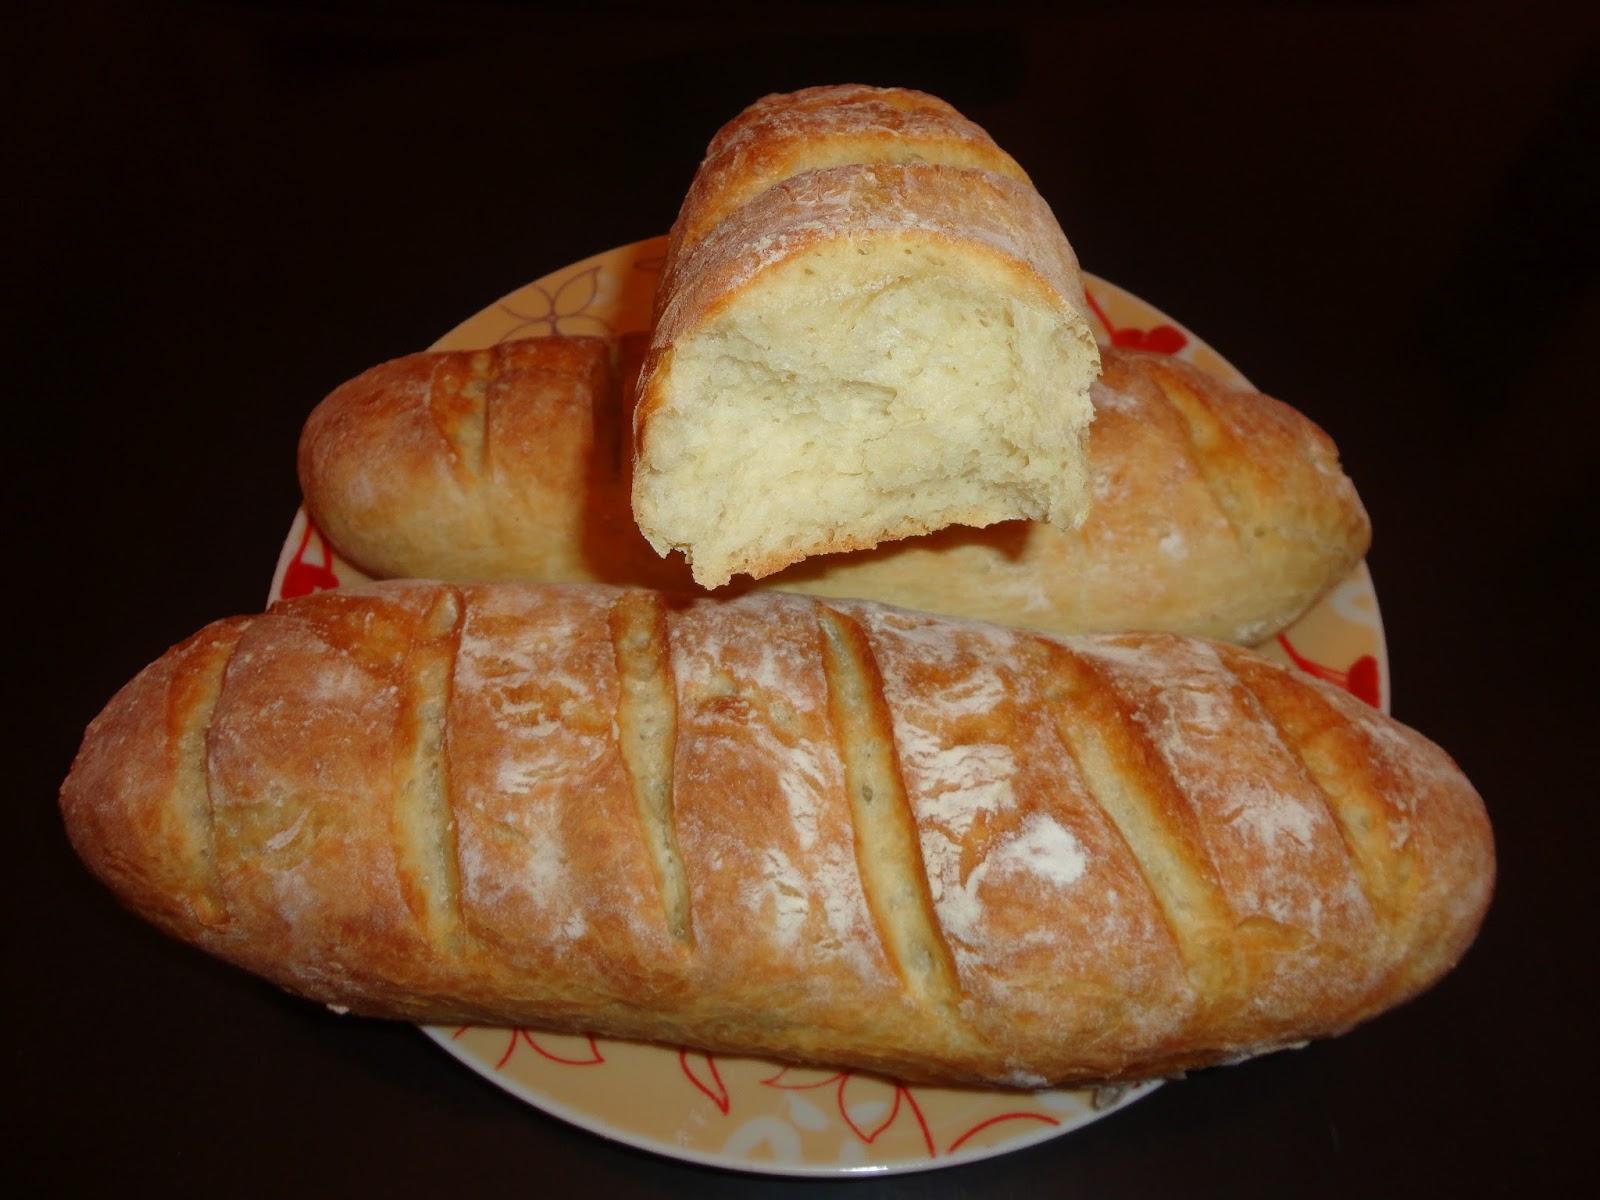 banh-mi-baguette 1